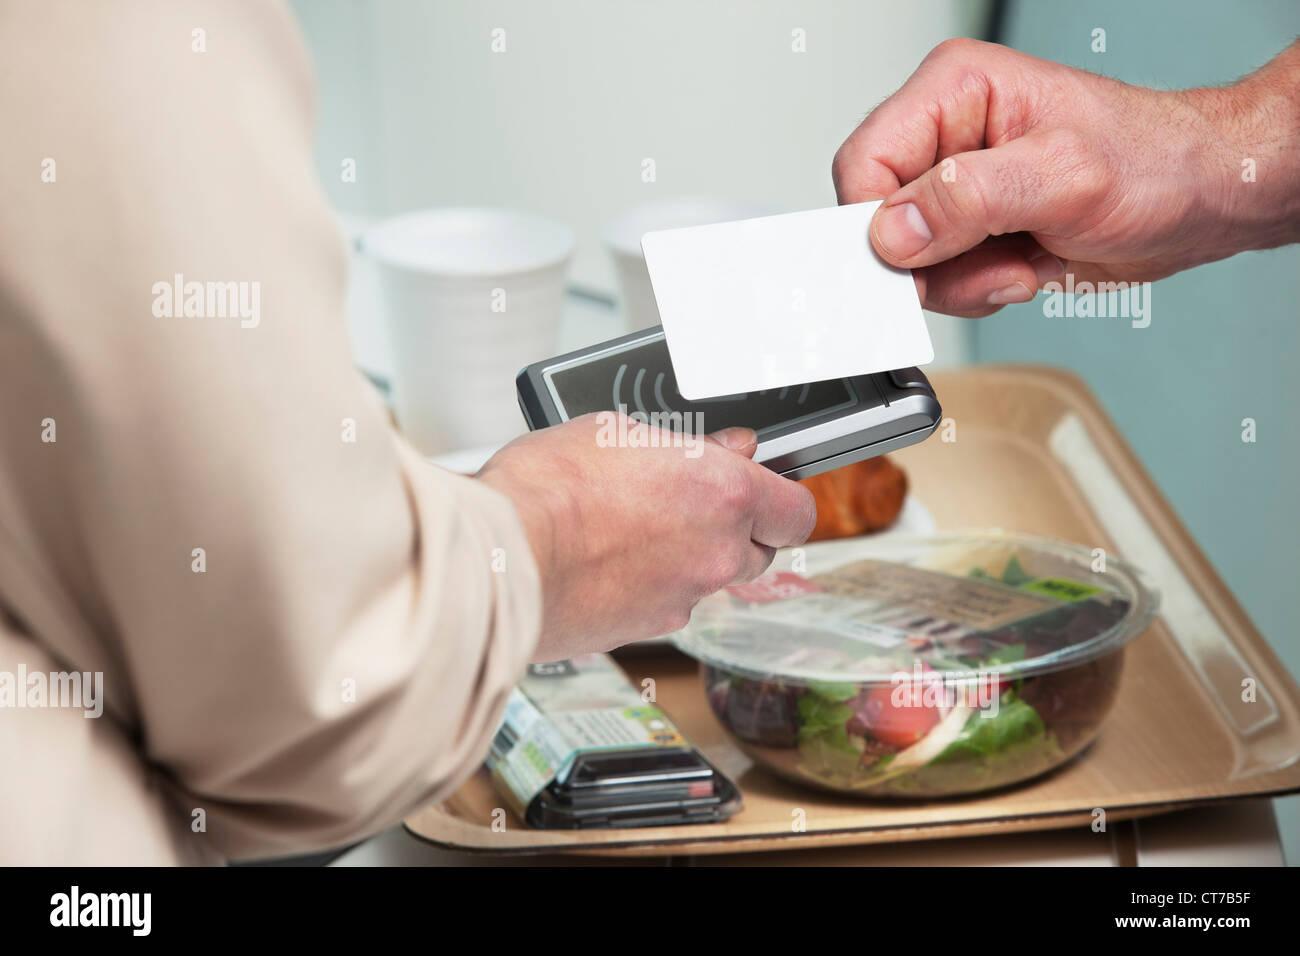 Man using card to buy food - Stock Image